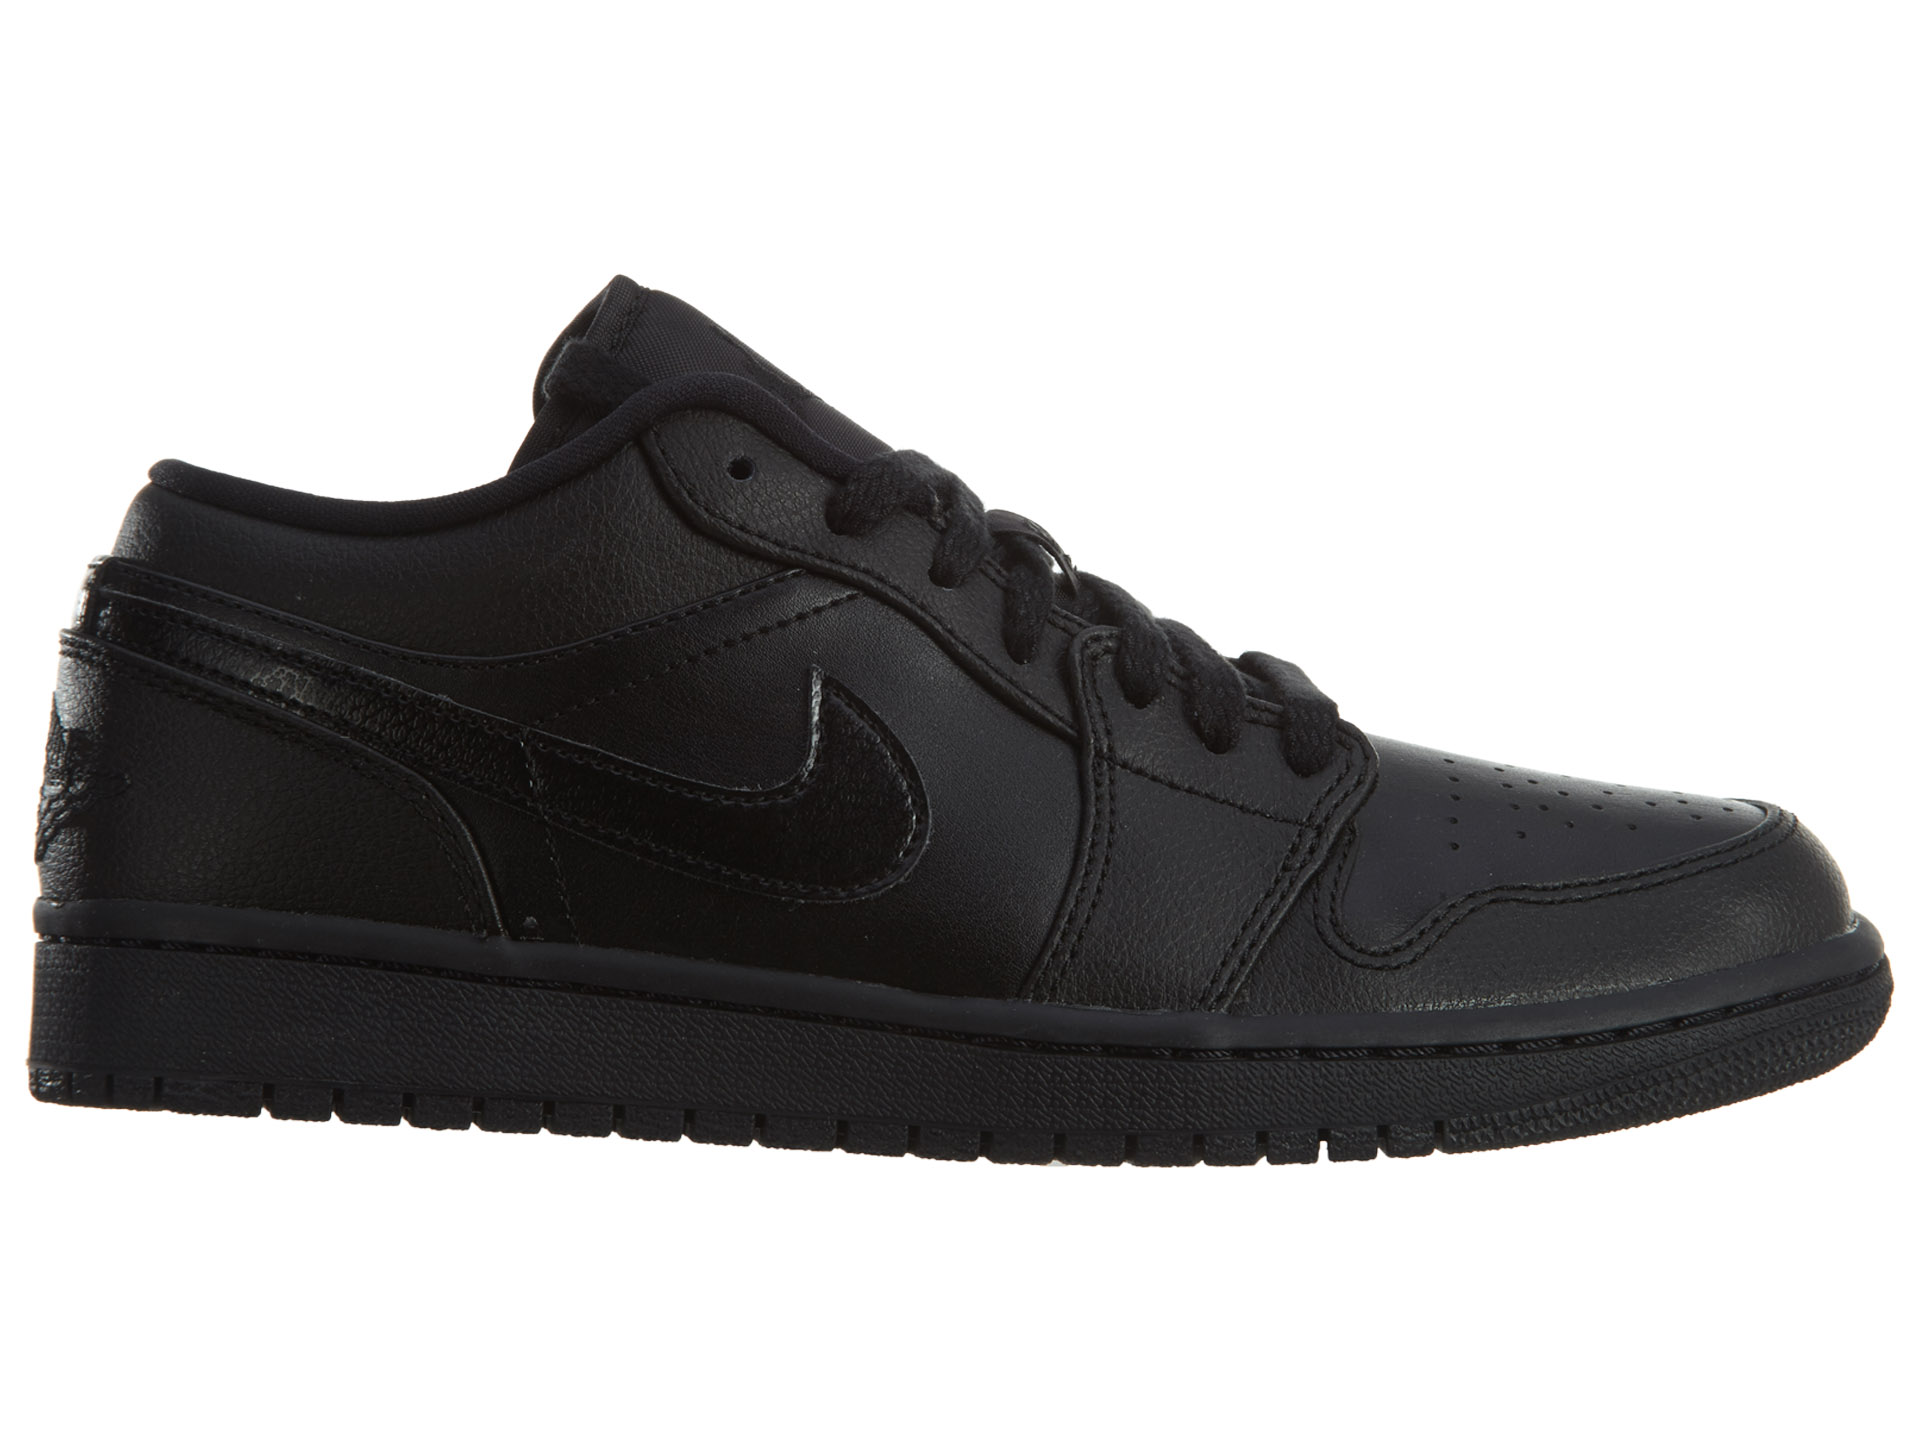 Jordan 1 Low Black Black Noir